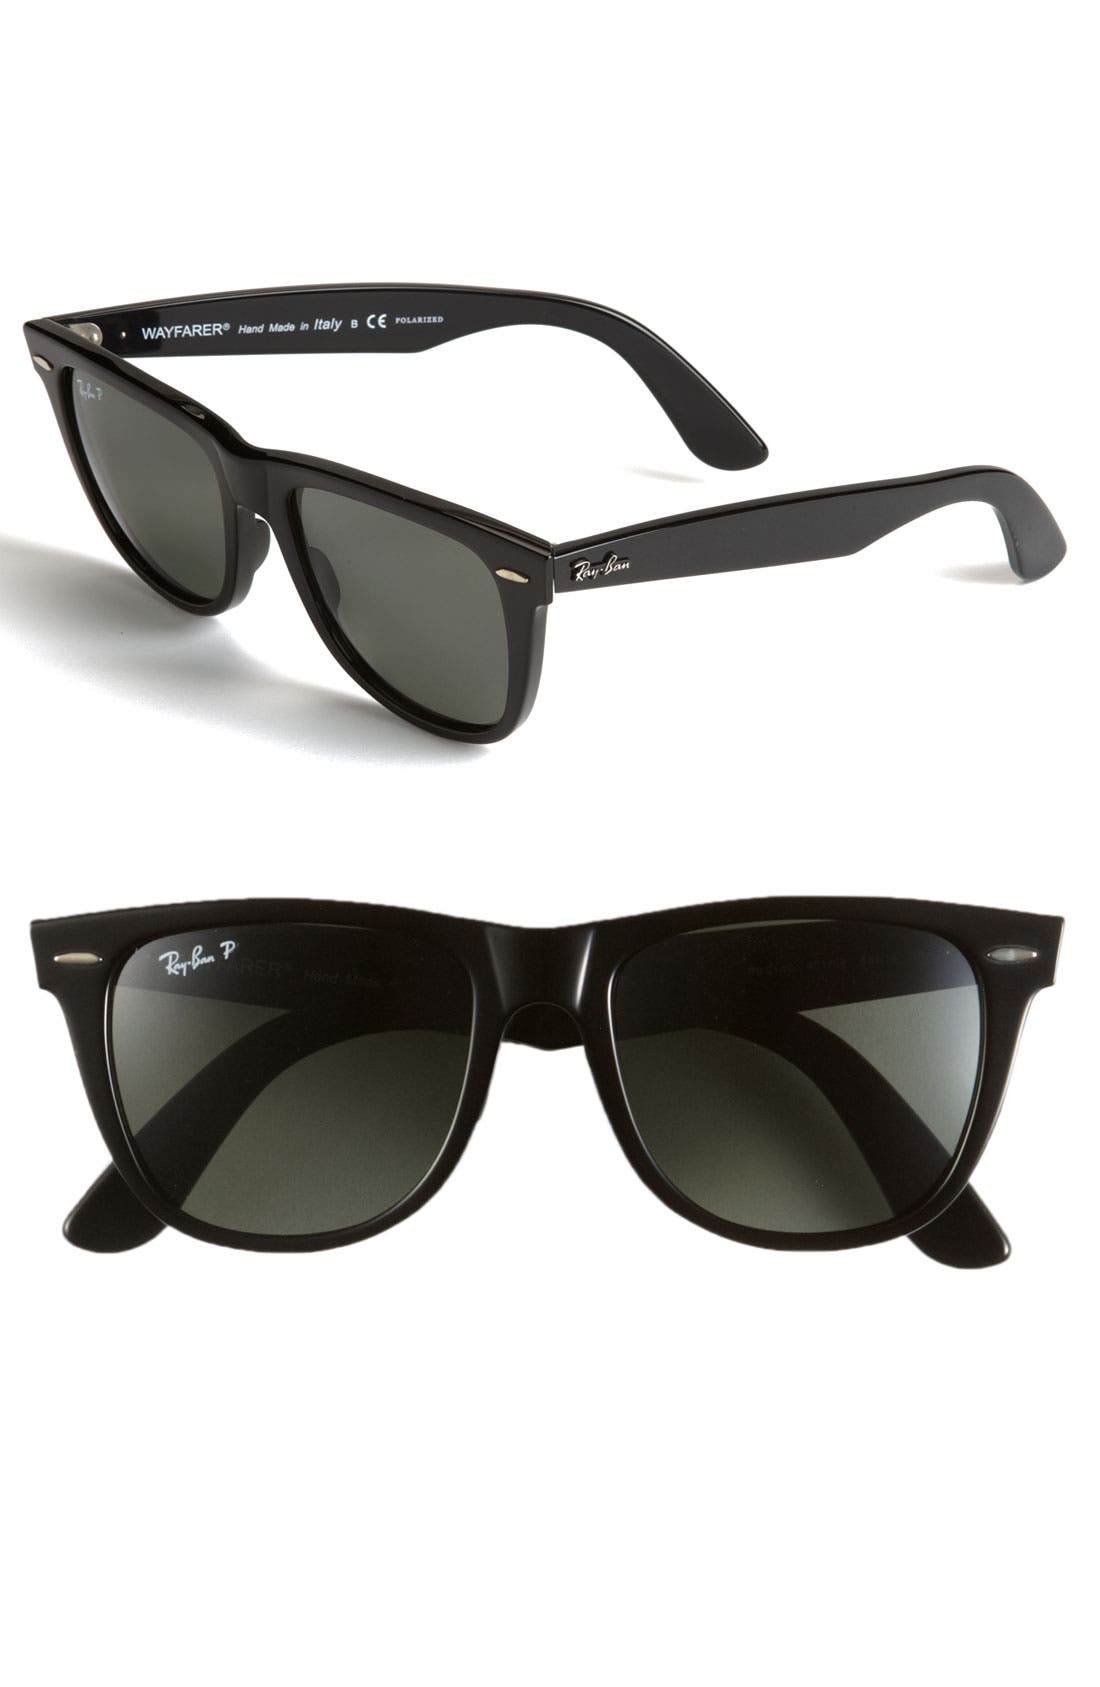 Main Image - Ray-Ban 'Classic Wayfarer' Polarized 54mm Sunglasses